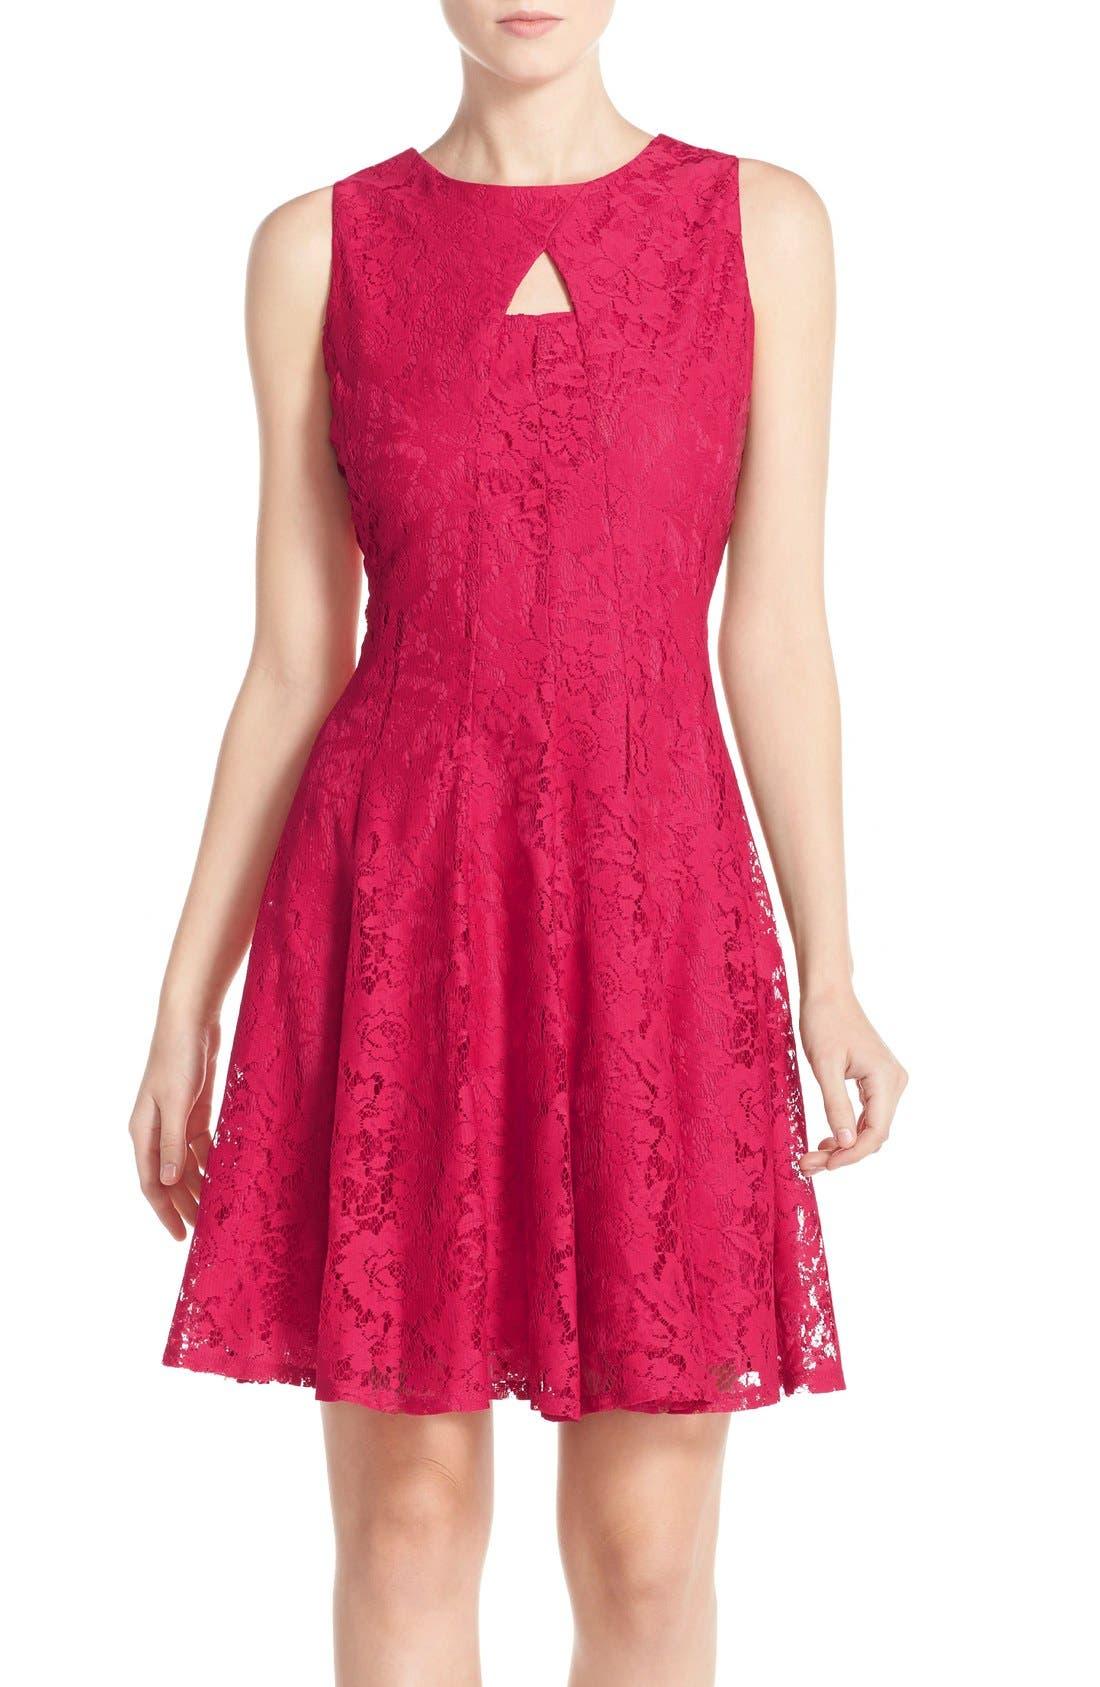 Alternate Image 1 Selected - Gabby Skye Keyhole Neck Lace Fit & Flare Dress